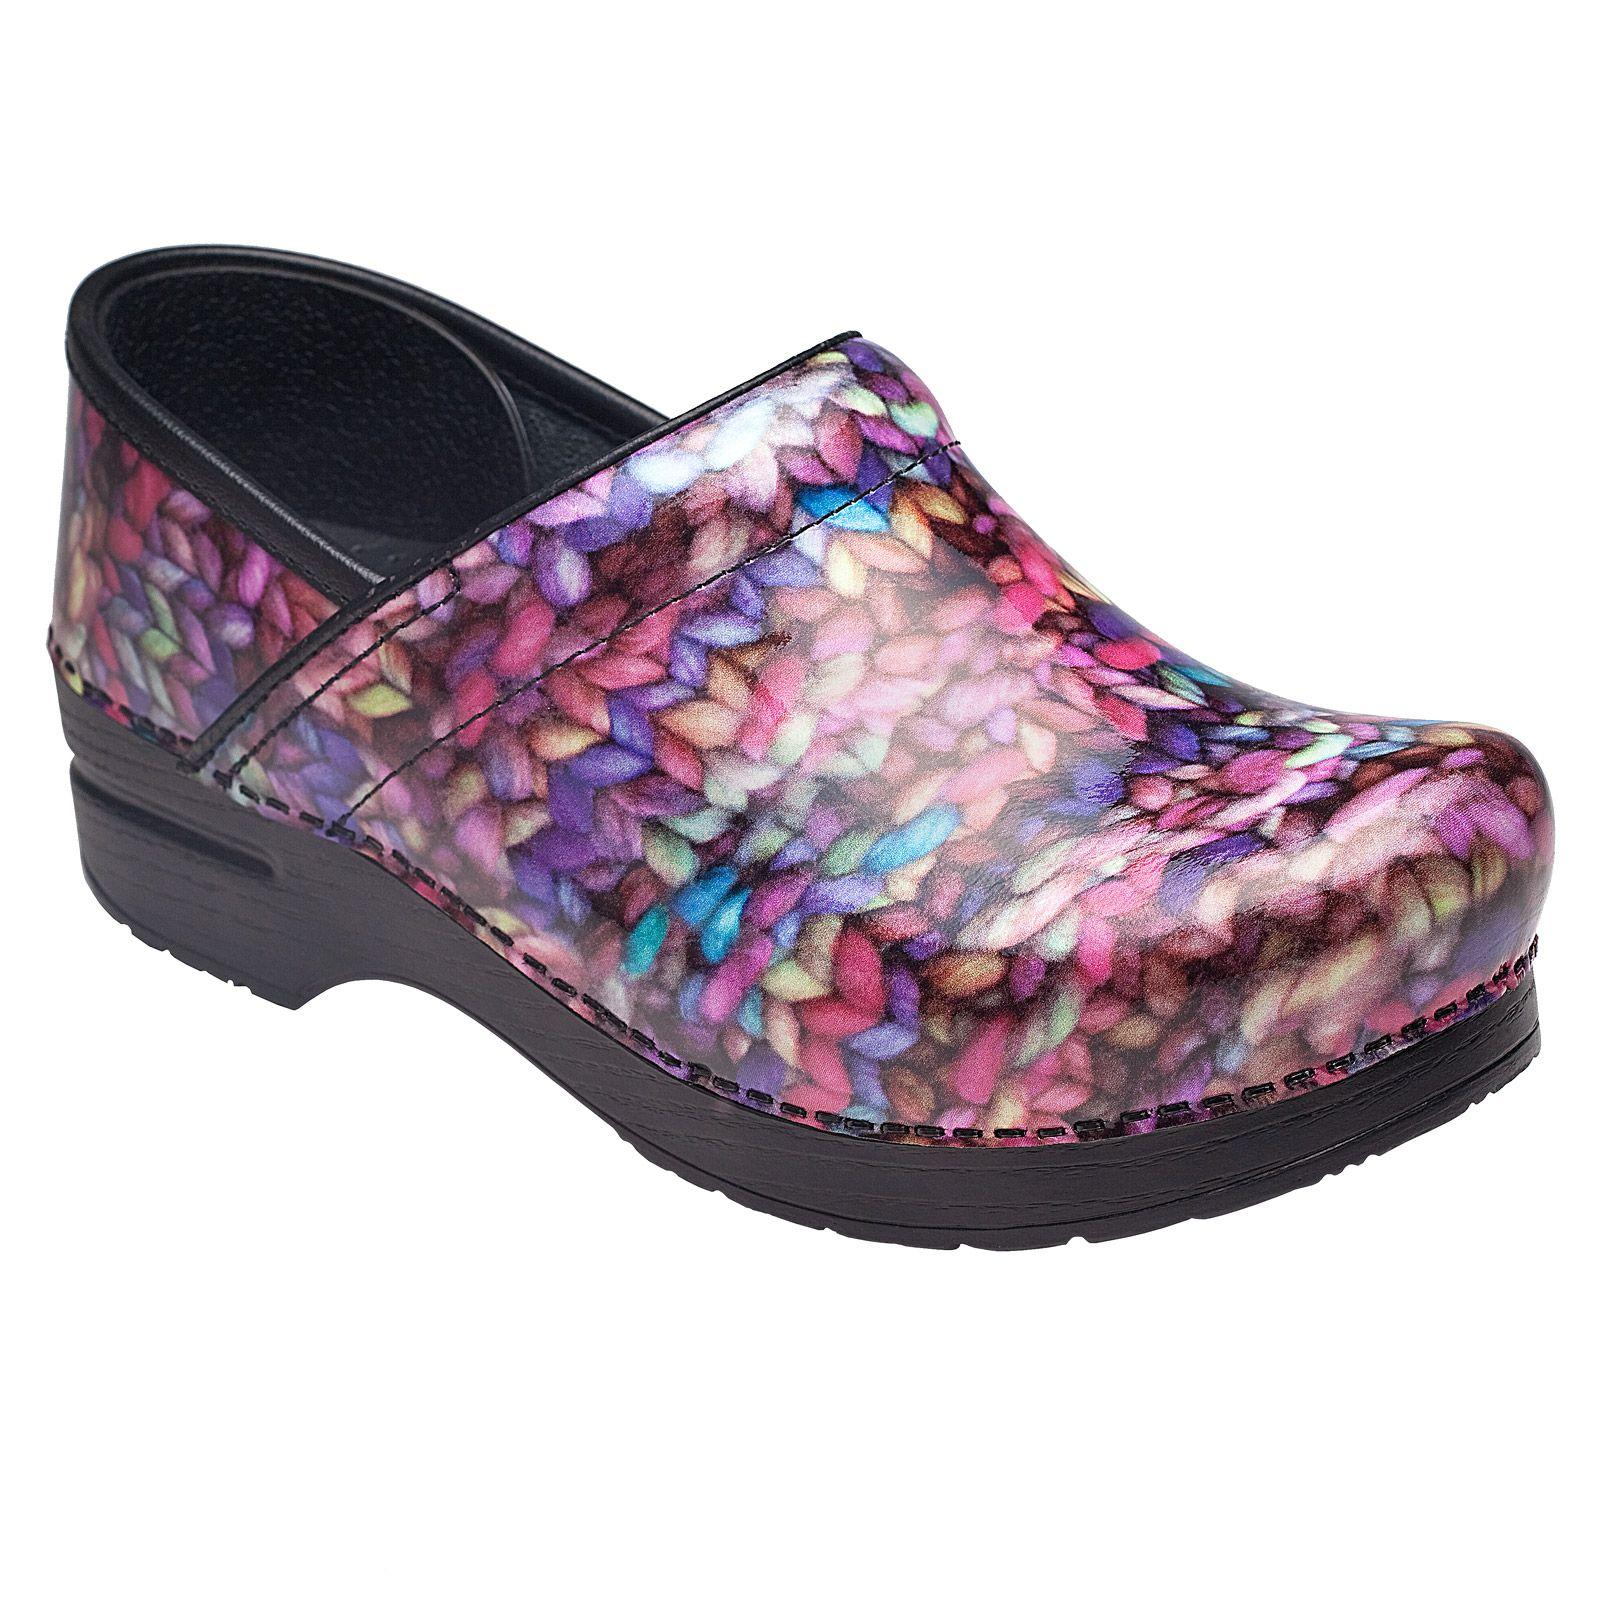 Dansko Shoes, nursing shoes and clogs for sale online.